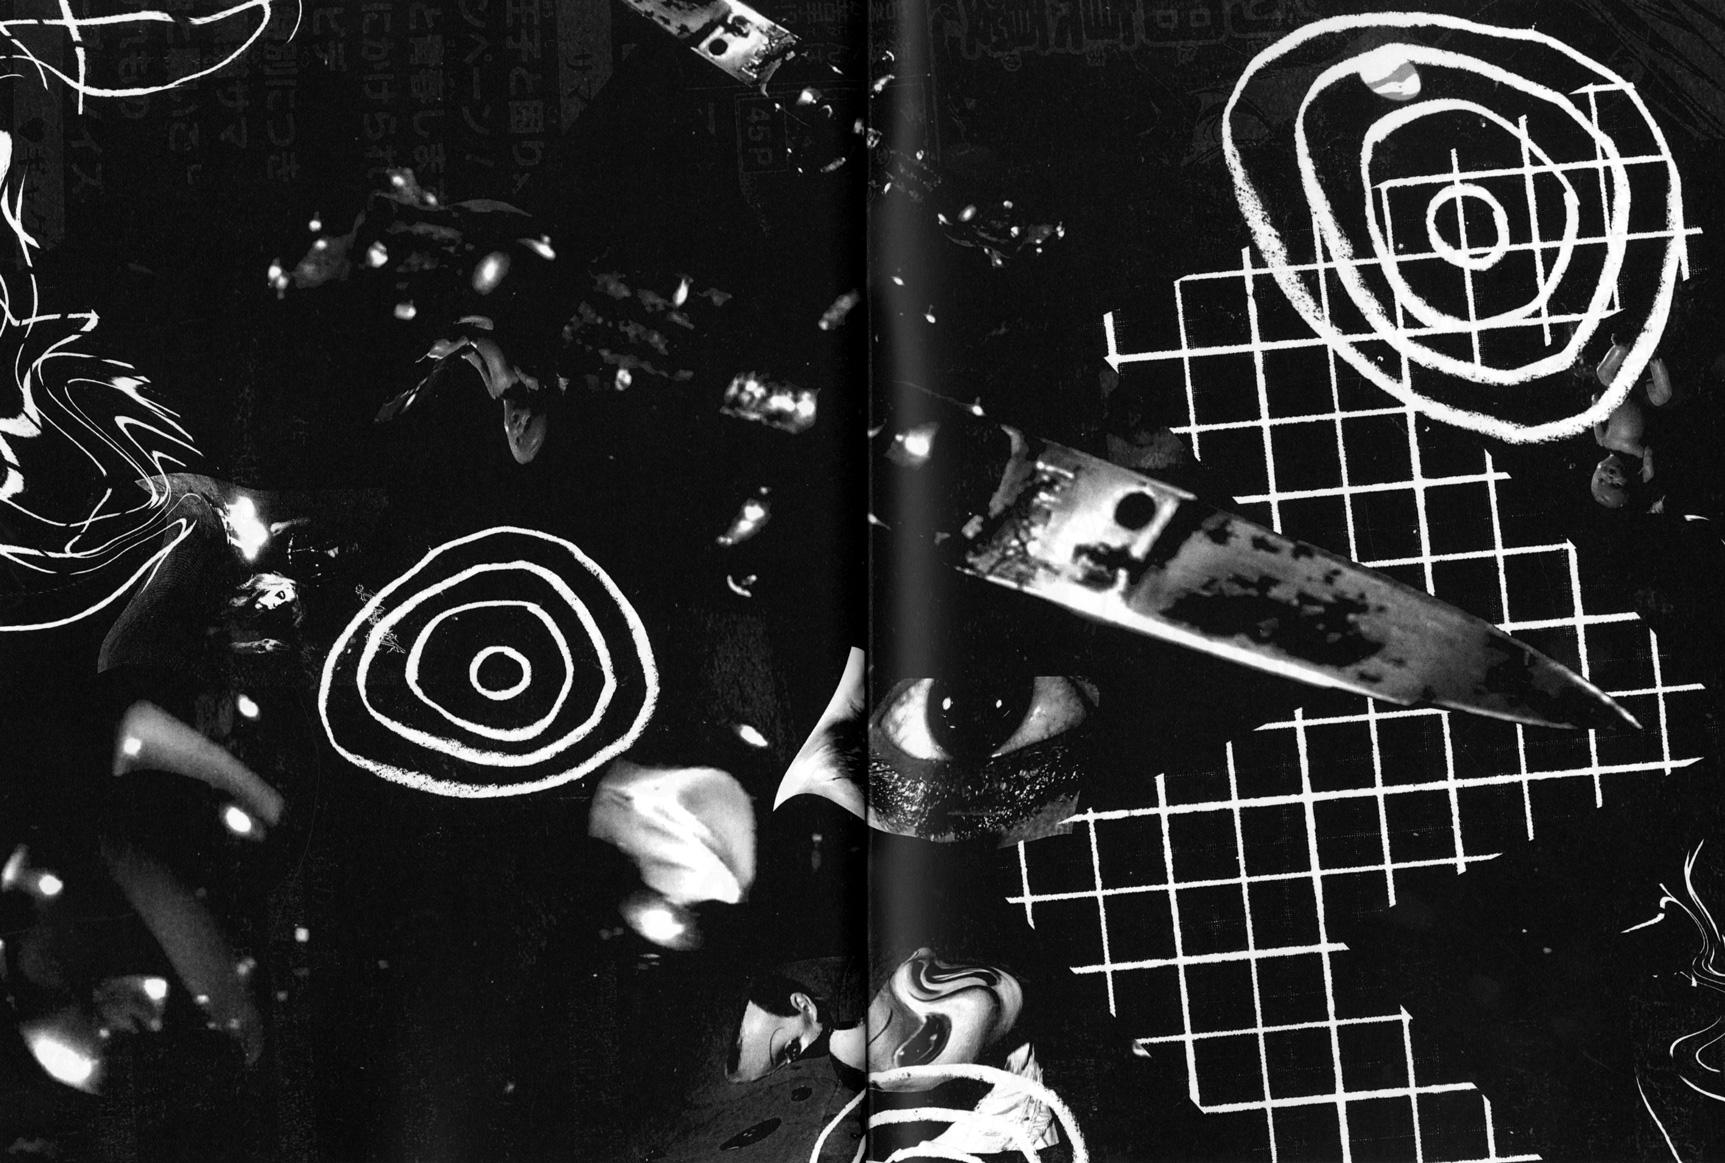 club_nightclub_spread_scan_27.jpg